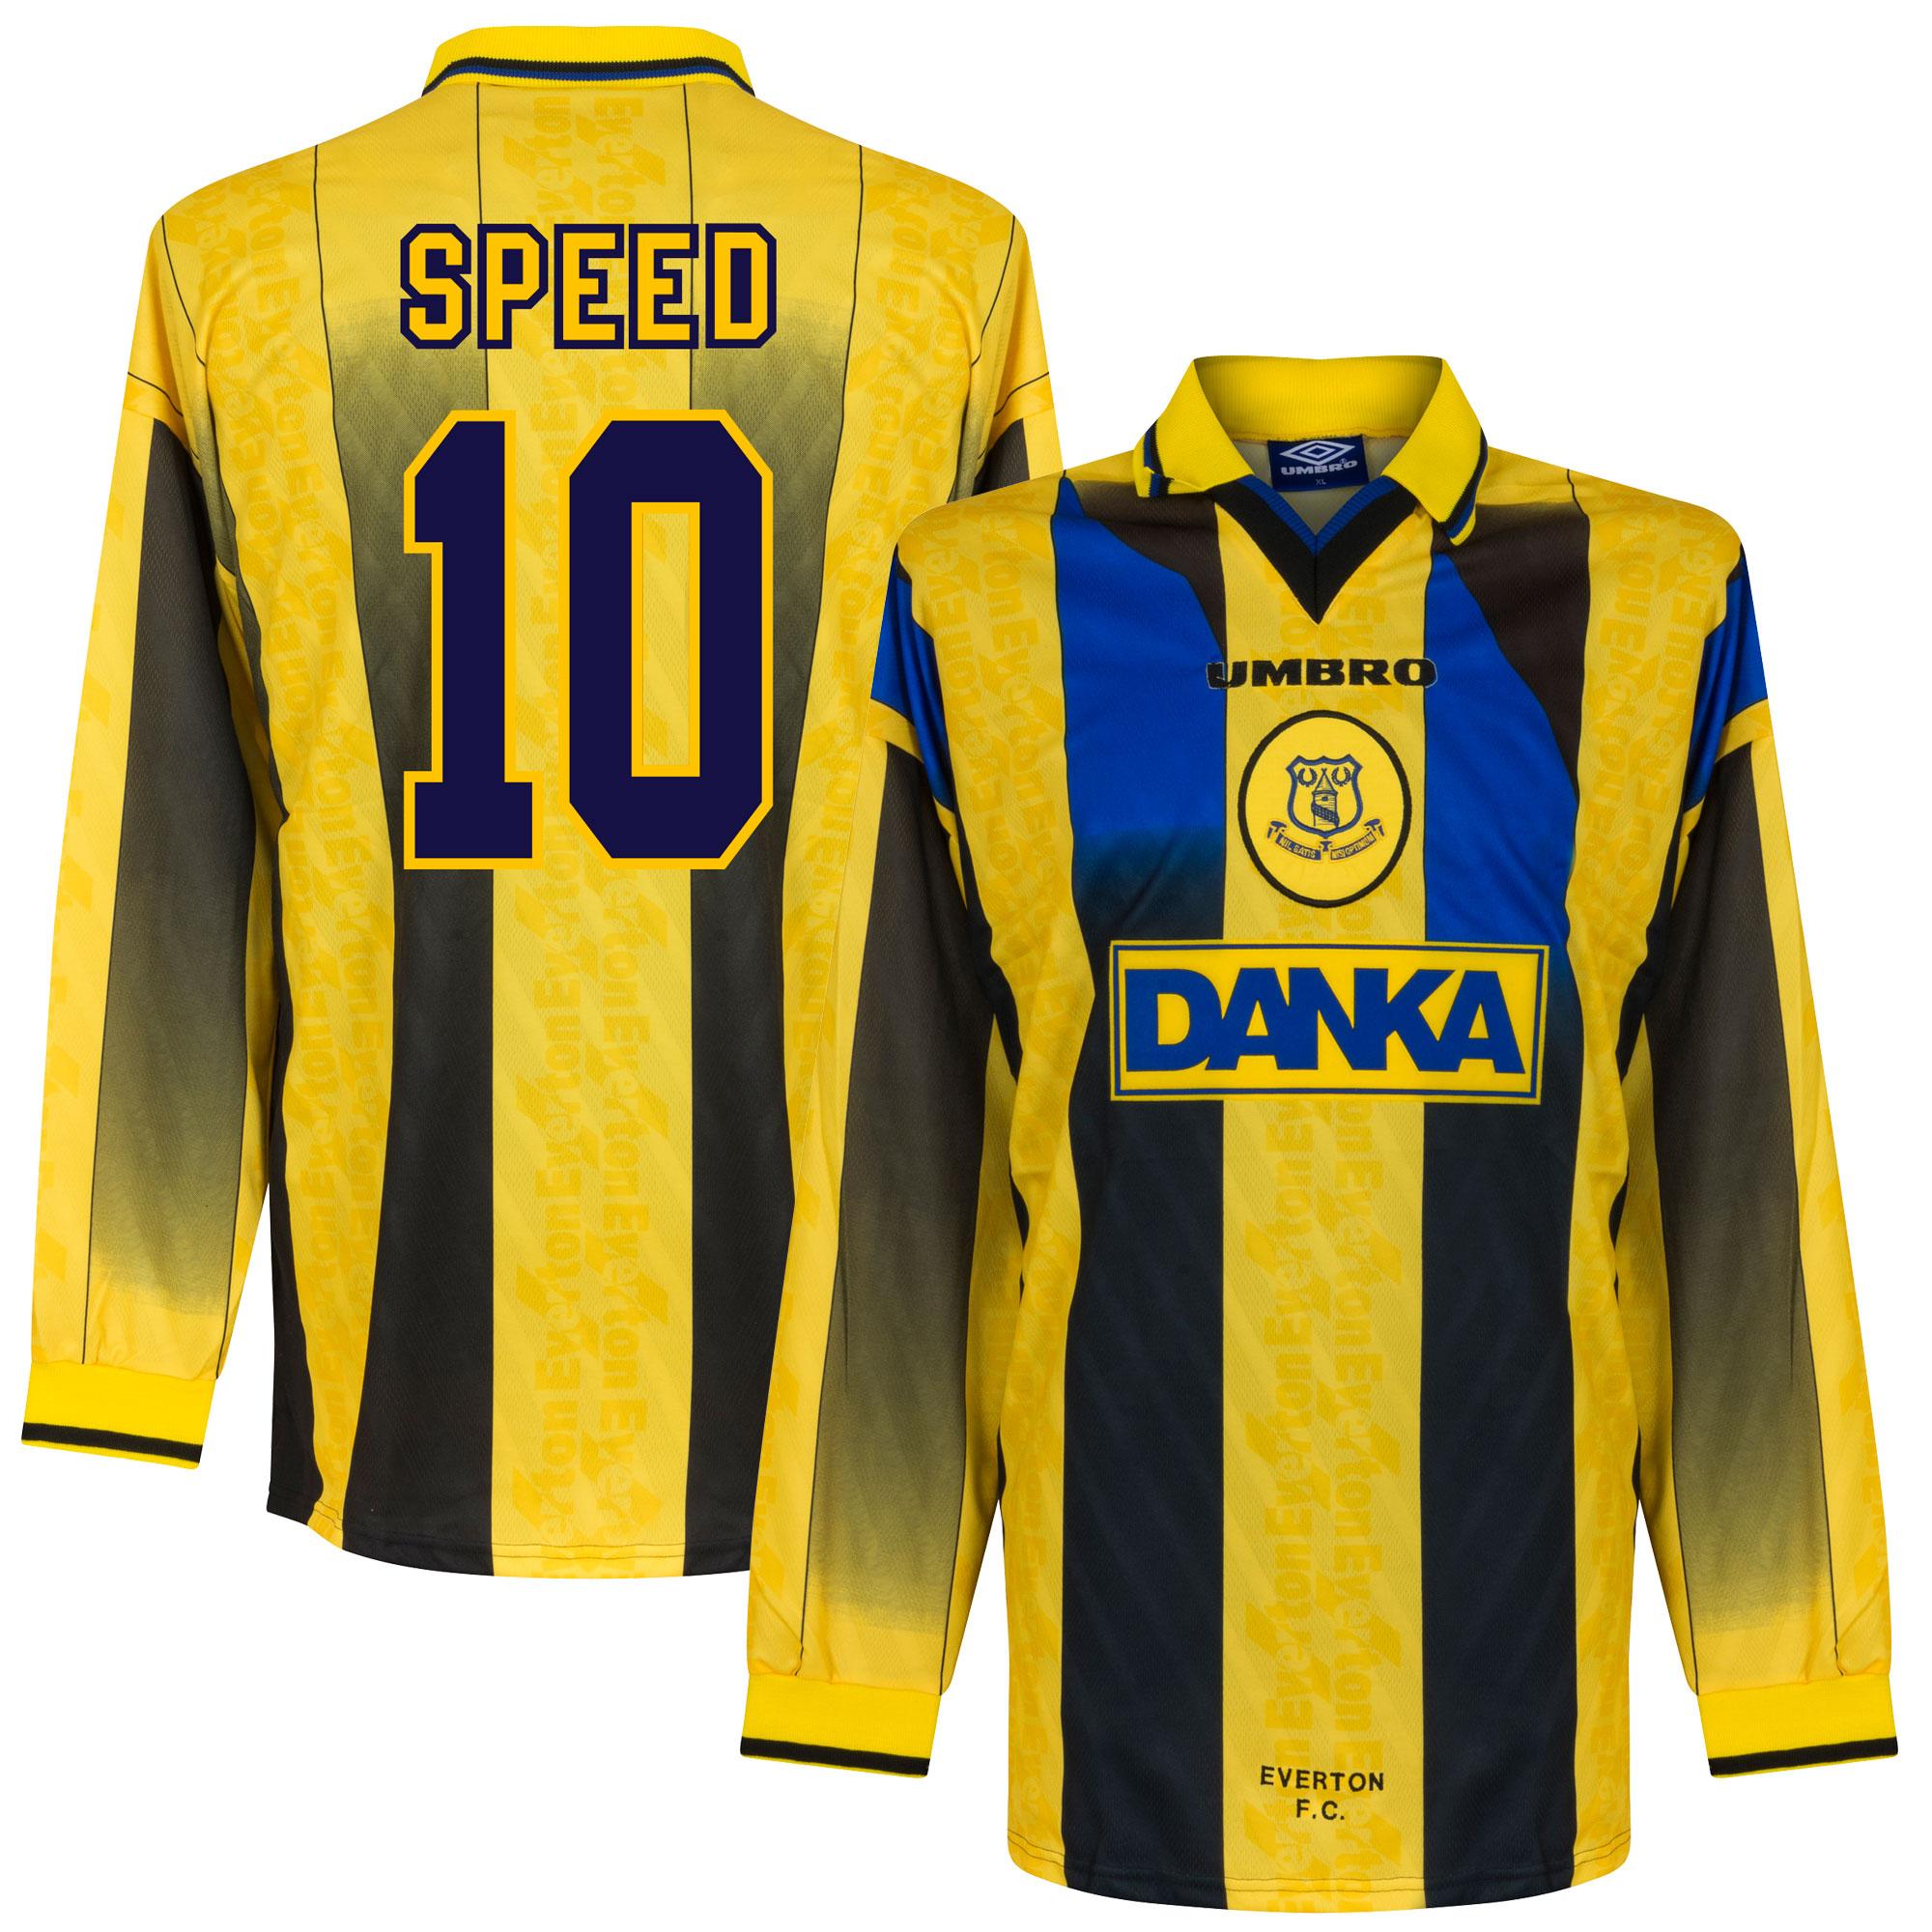 96-97 Everton Away L/S Players Jersey + Speed 10 - XL